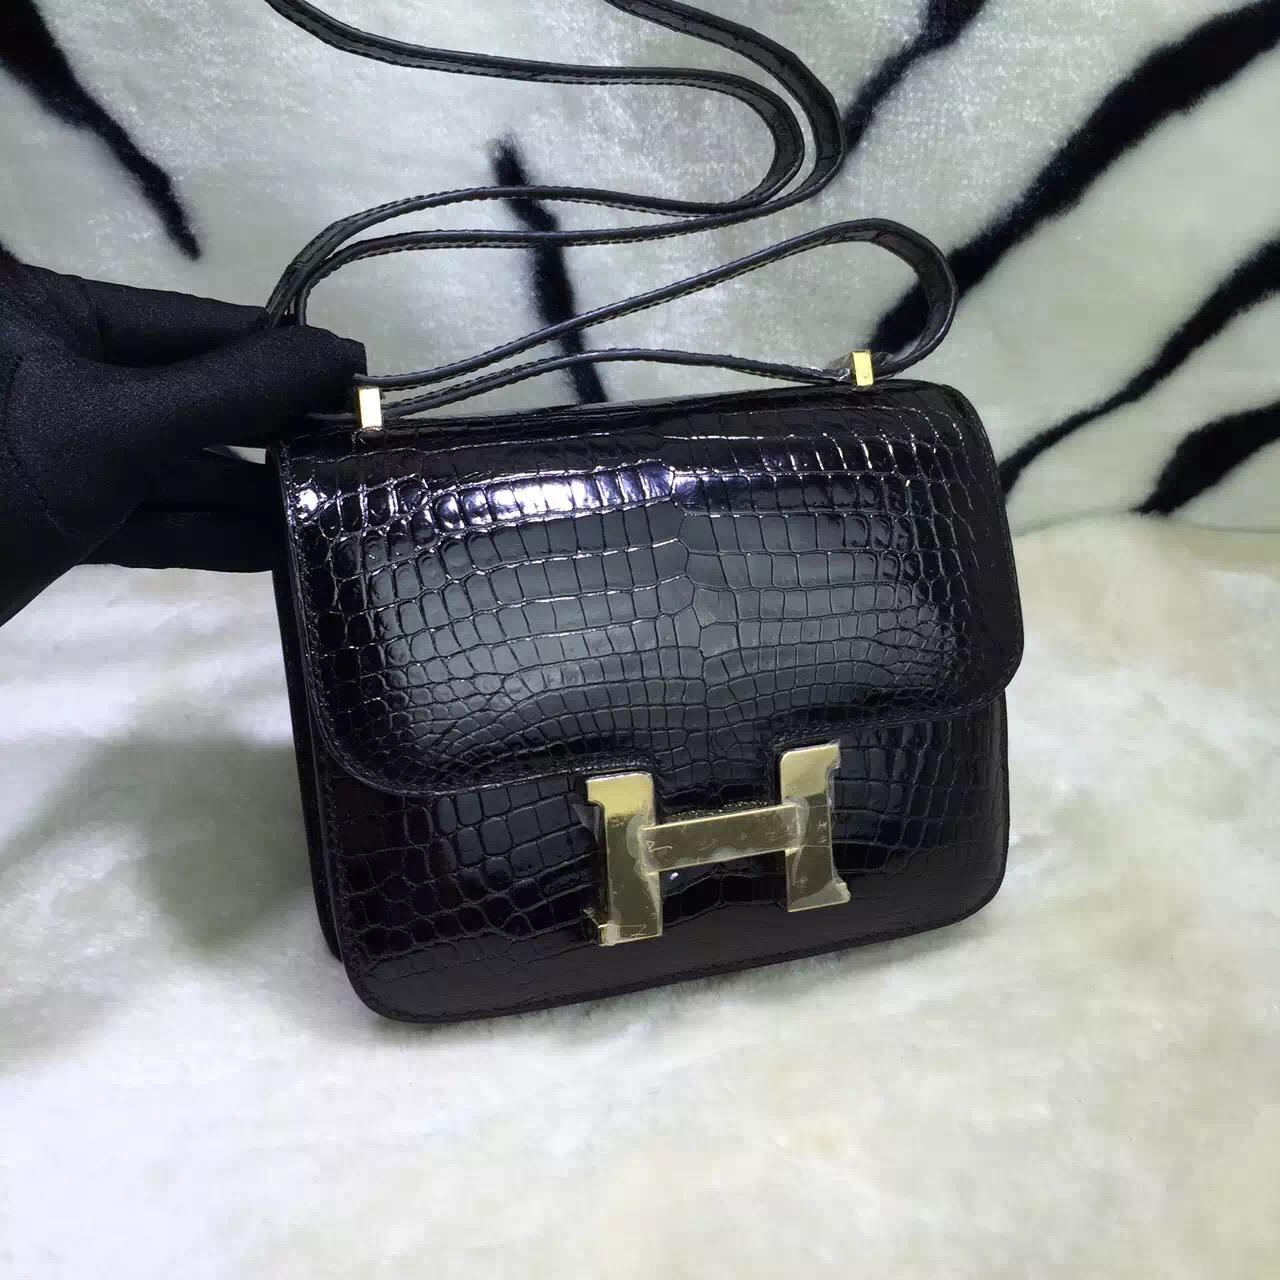 Discount Hermes Crocodile Leather Constance Bag 19CM CK89 Black Gold Hardware